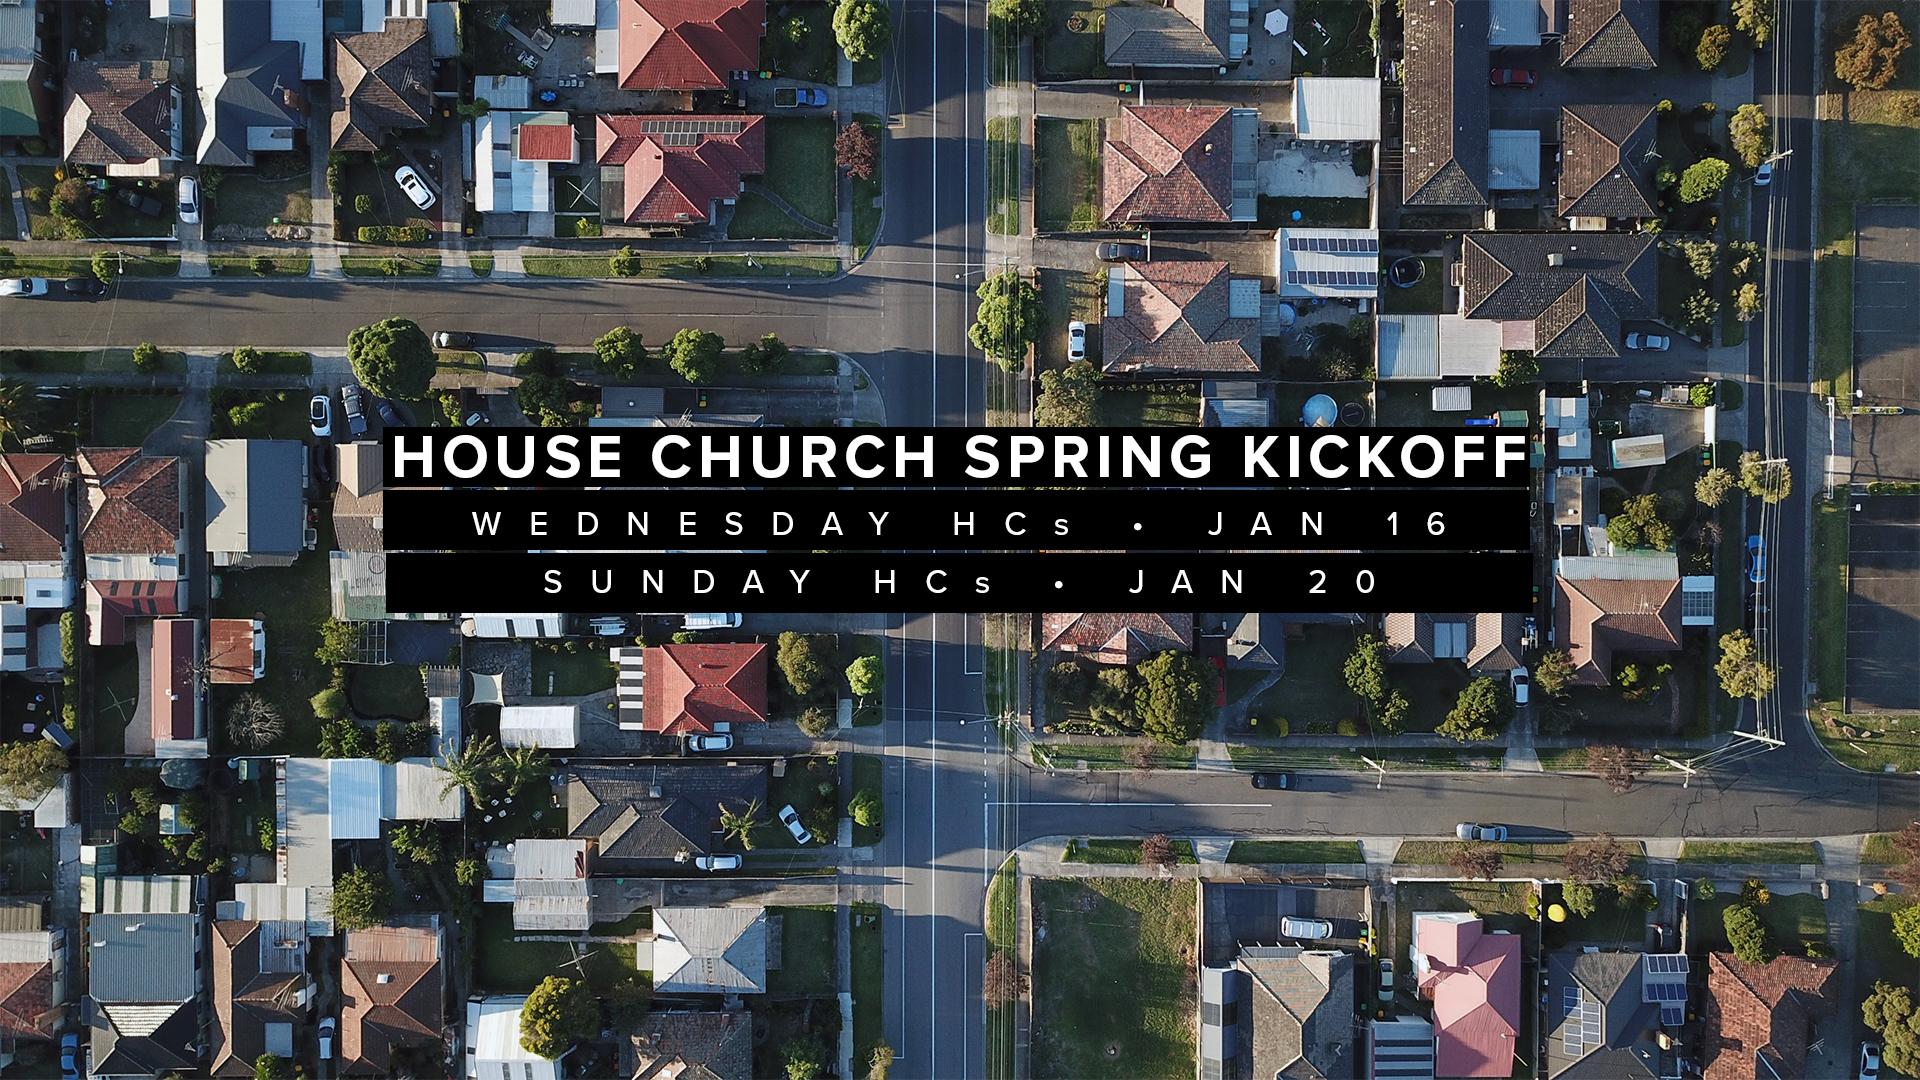 House Church Spring Kickoff Graphic - Widescreen.jpg